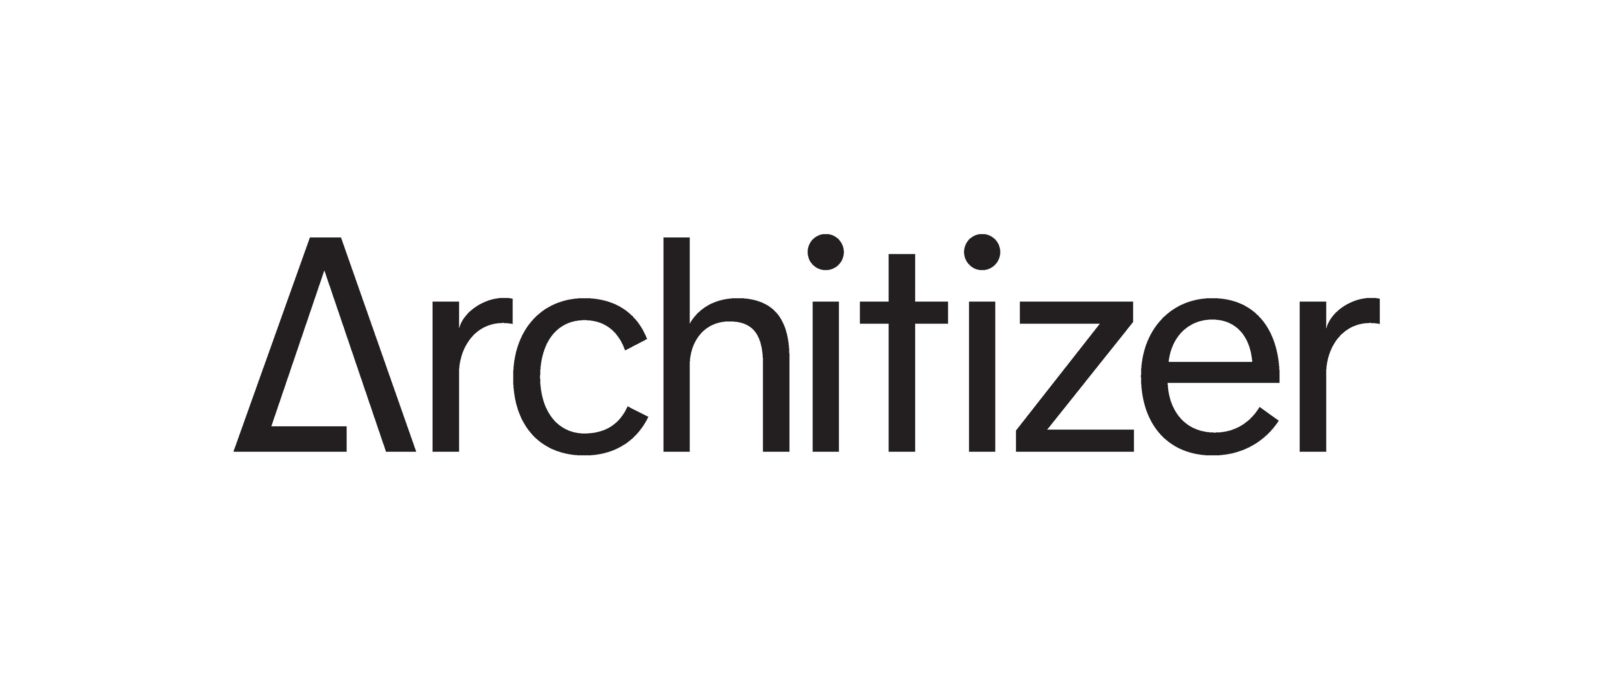 Battery Park awarded Finalist position in international Architizer Awards